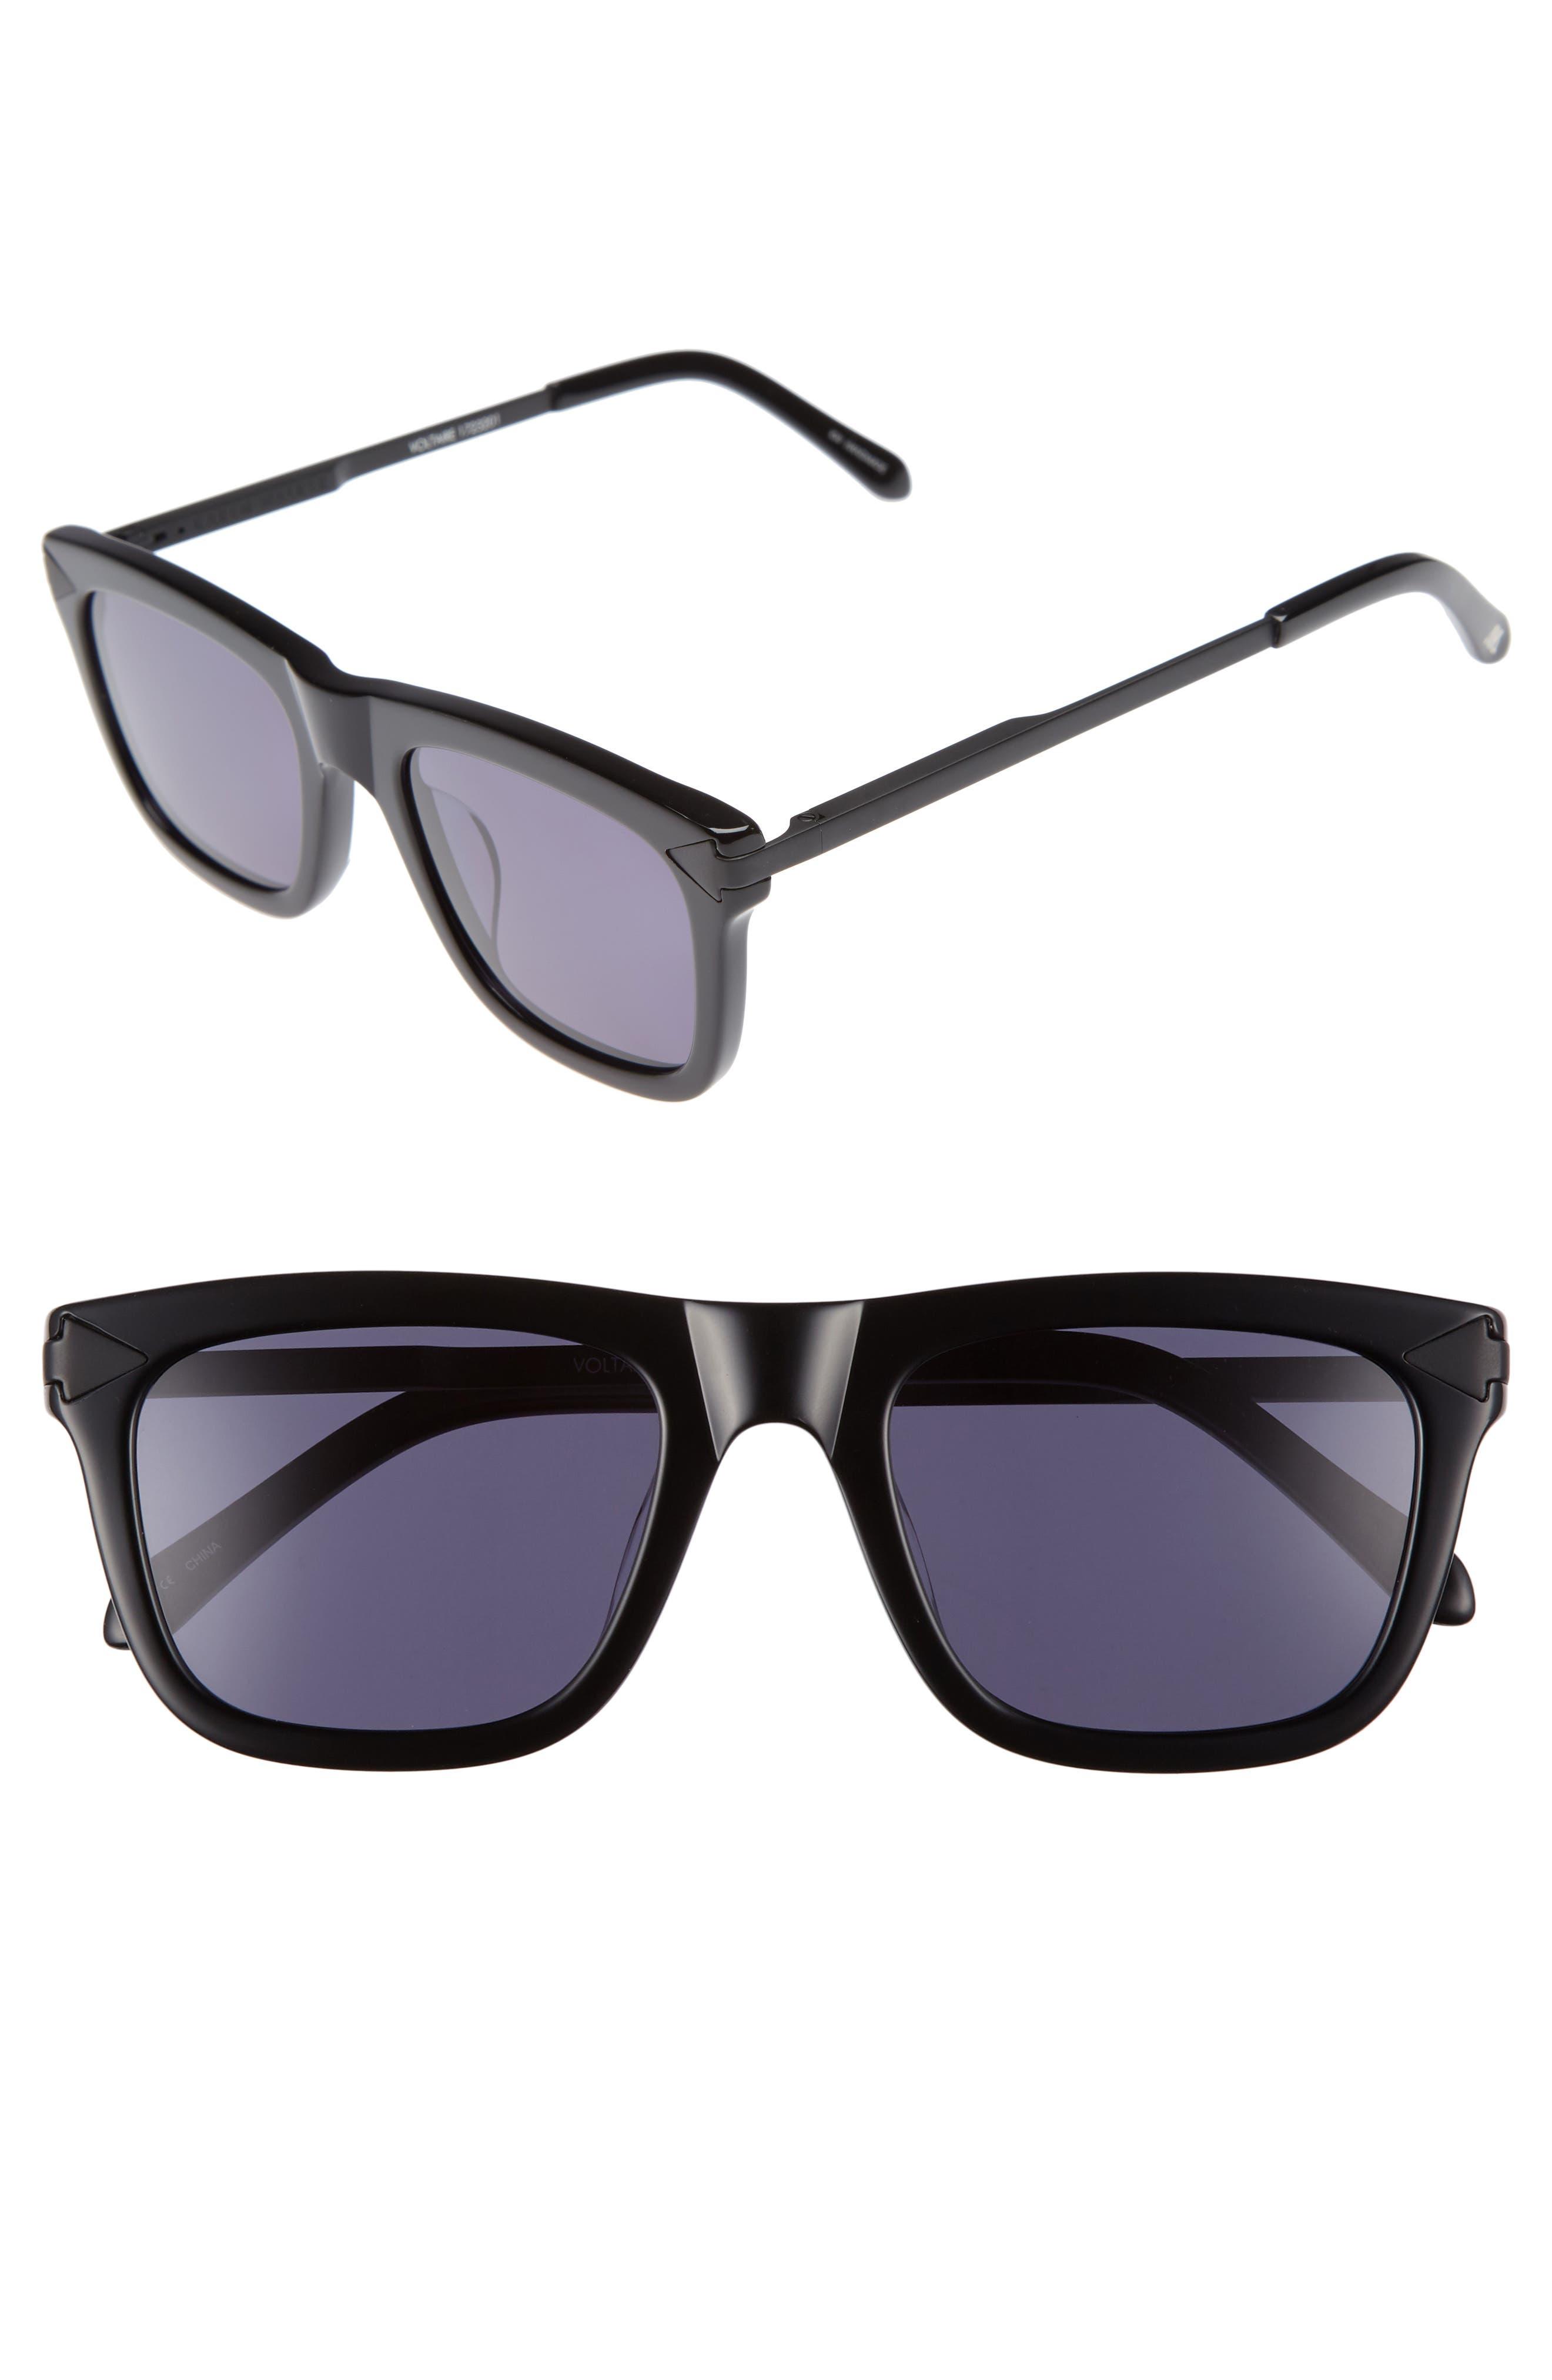 x Monumental Voltaire 51mm Polarized Sunglasses,                             Main thumbnail 1, color,                             001